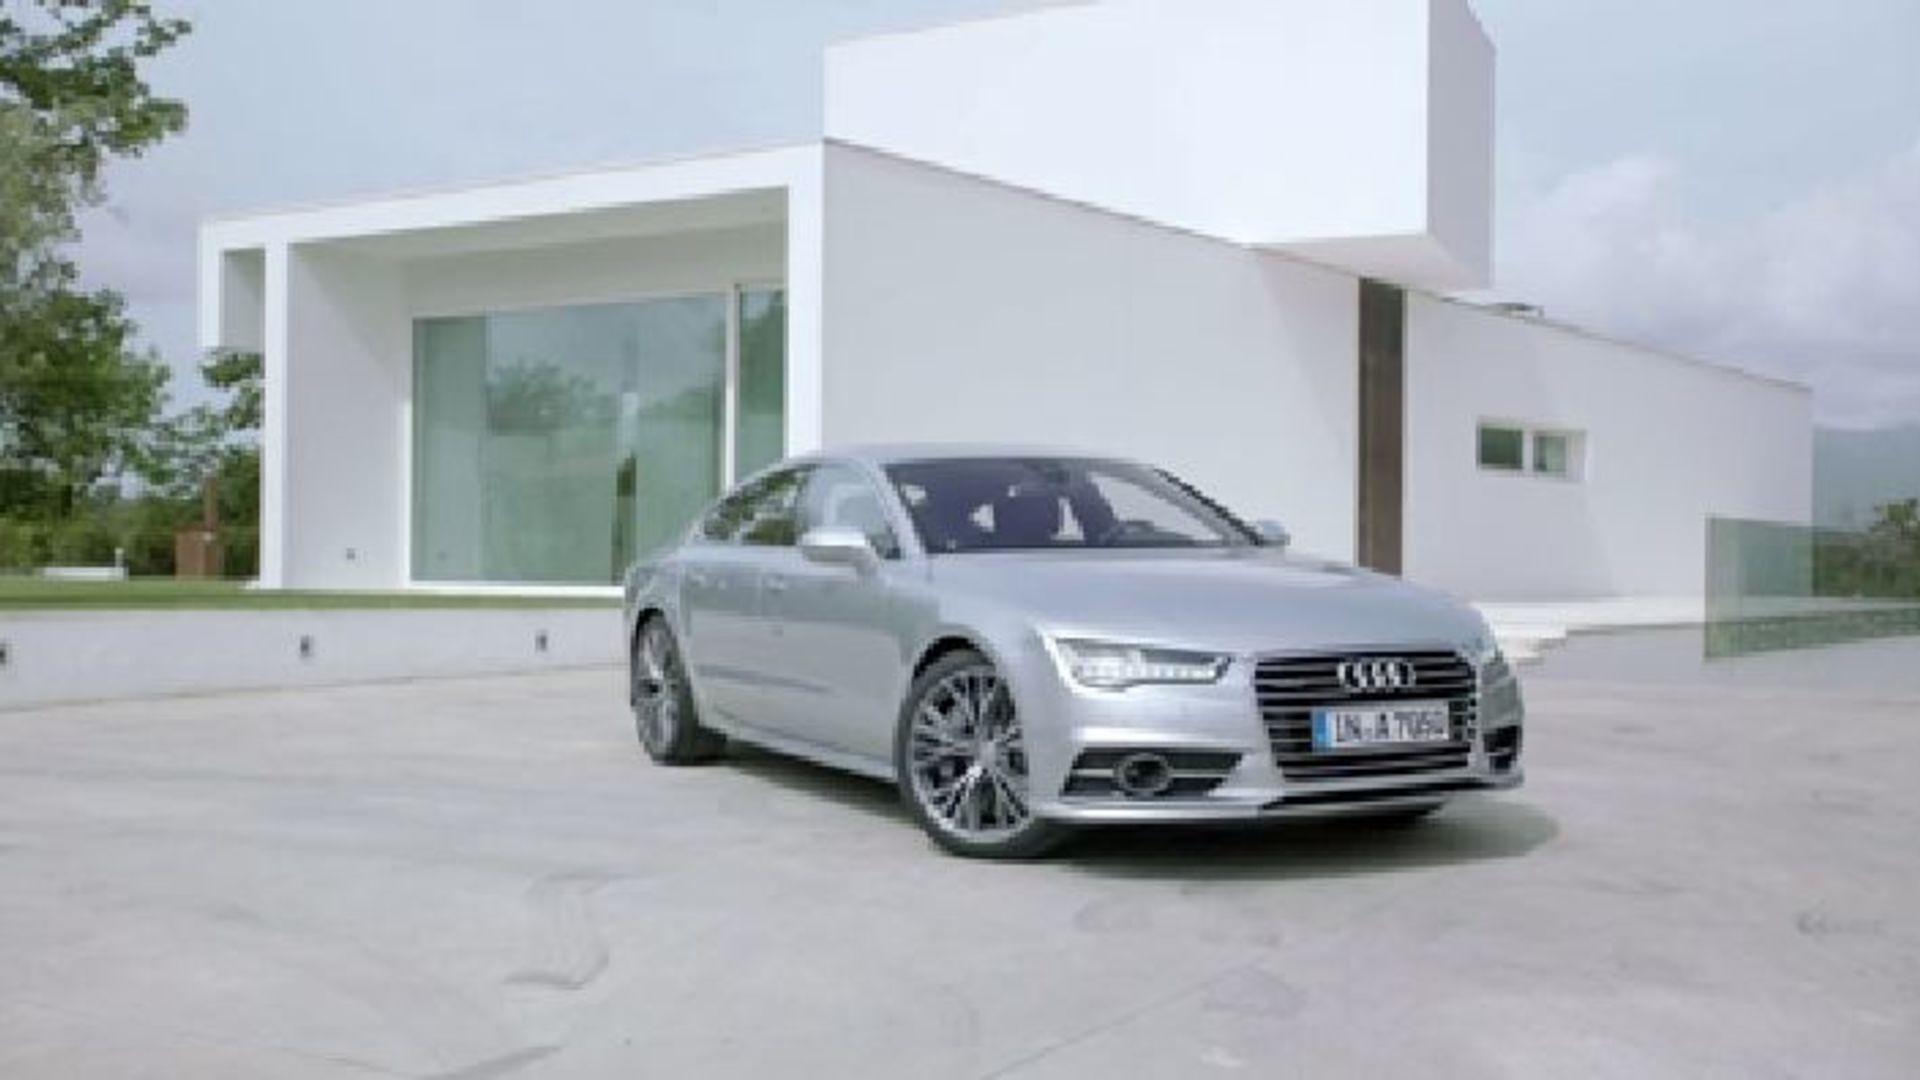 The Audi A7 Sportback - Footage